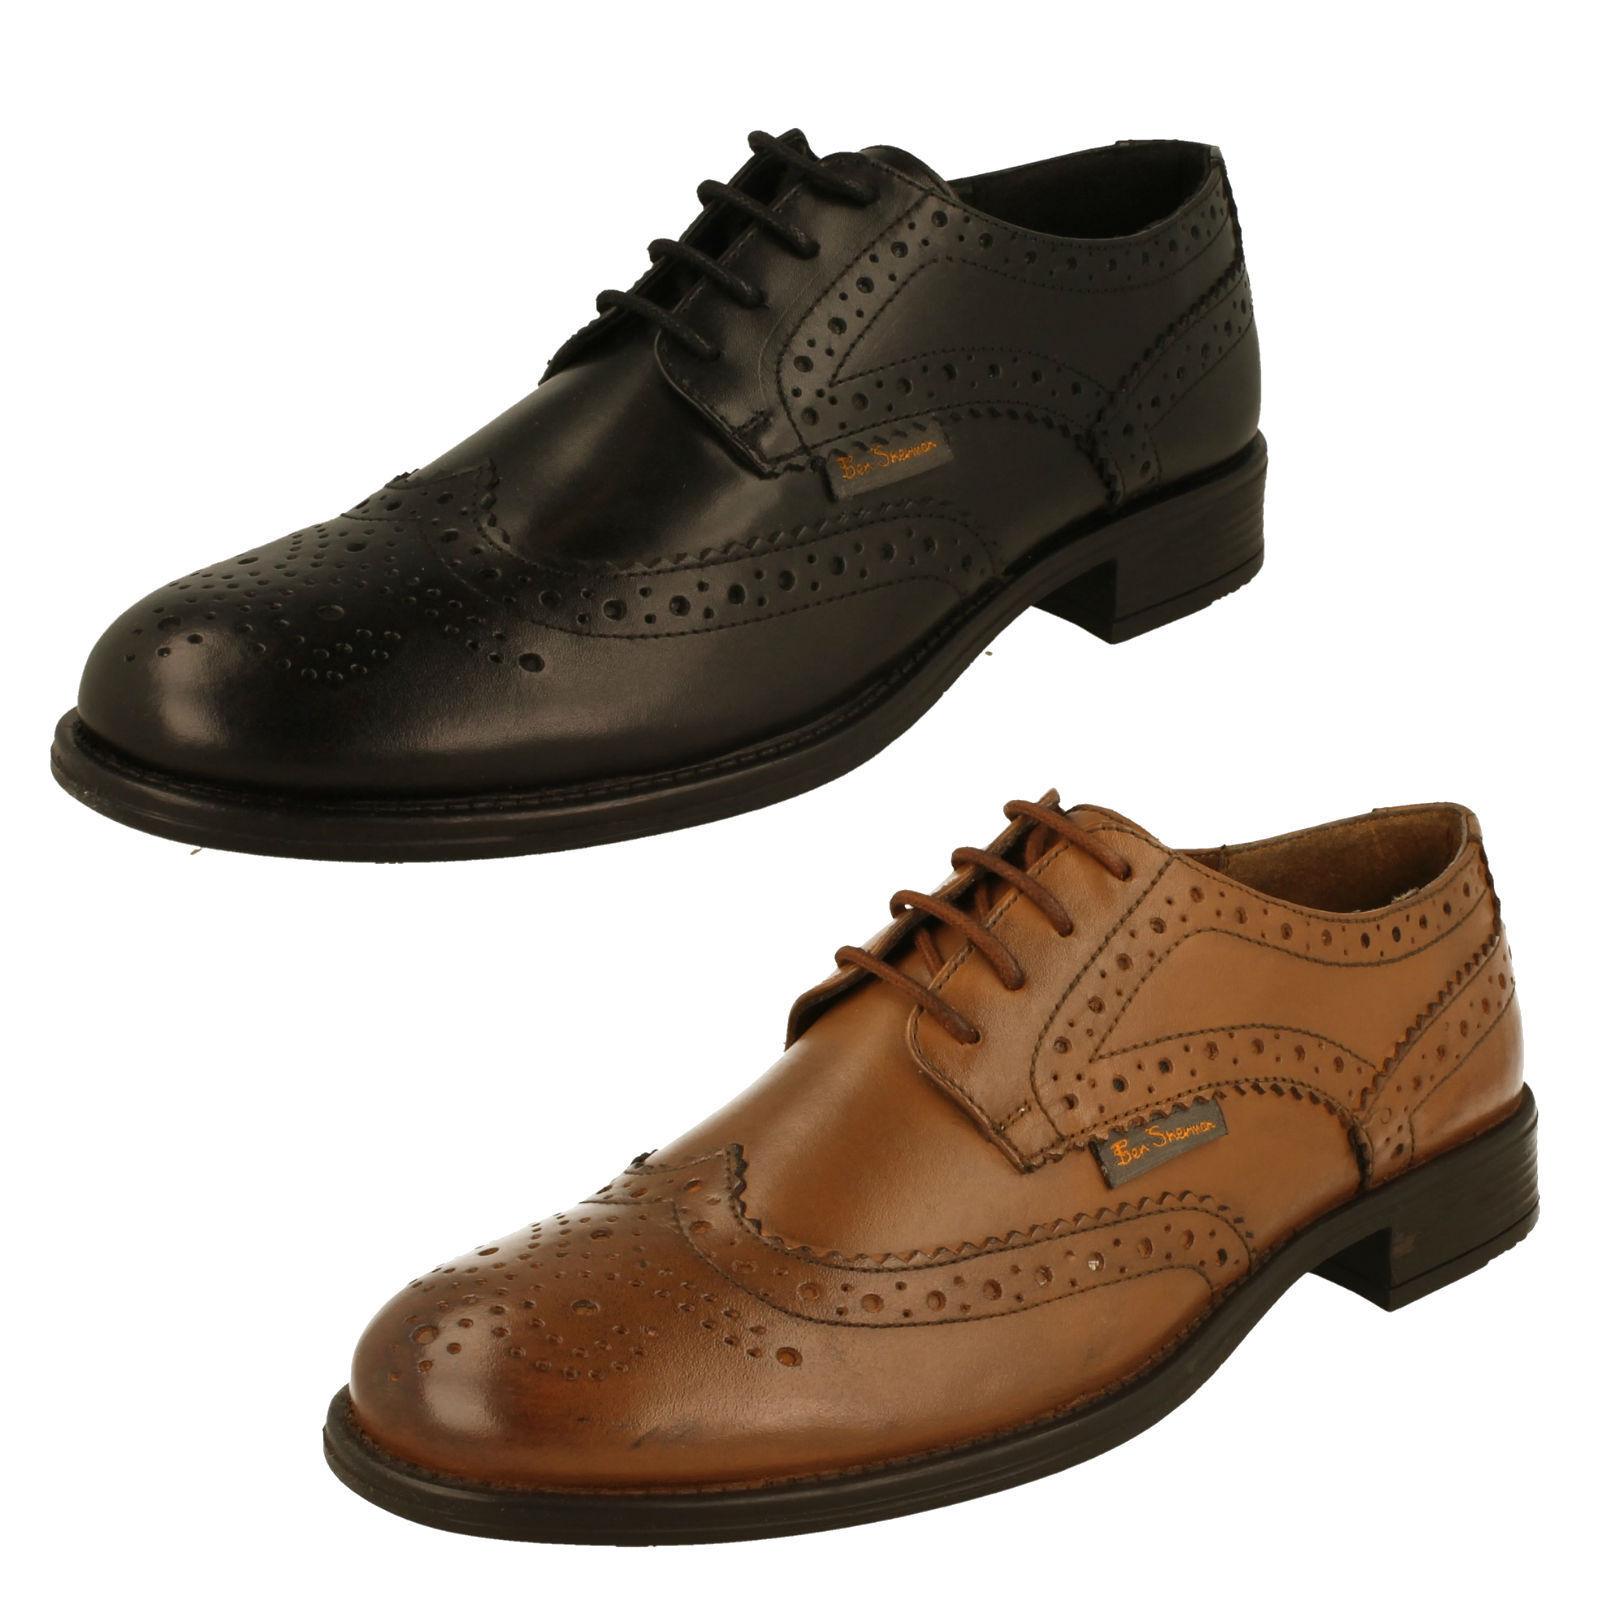 Men's Ben Sherman Brogue Shoes - Simpson